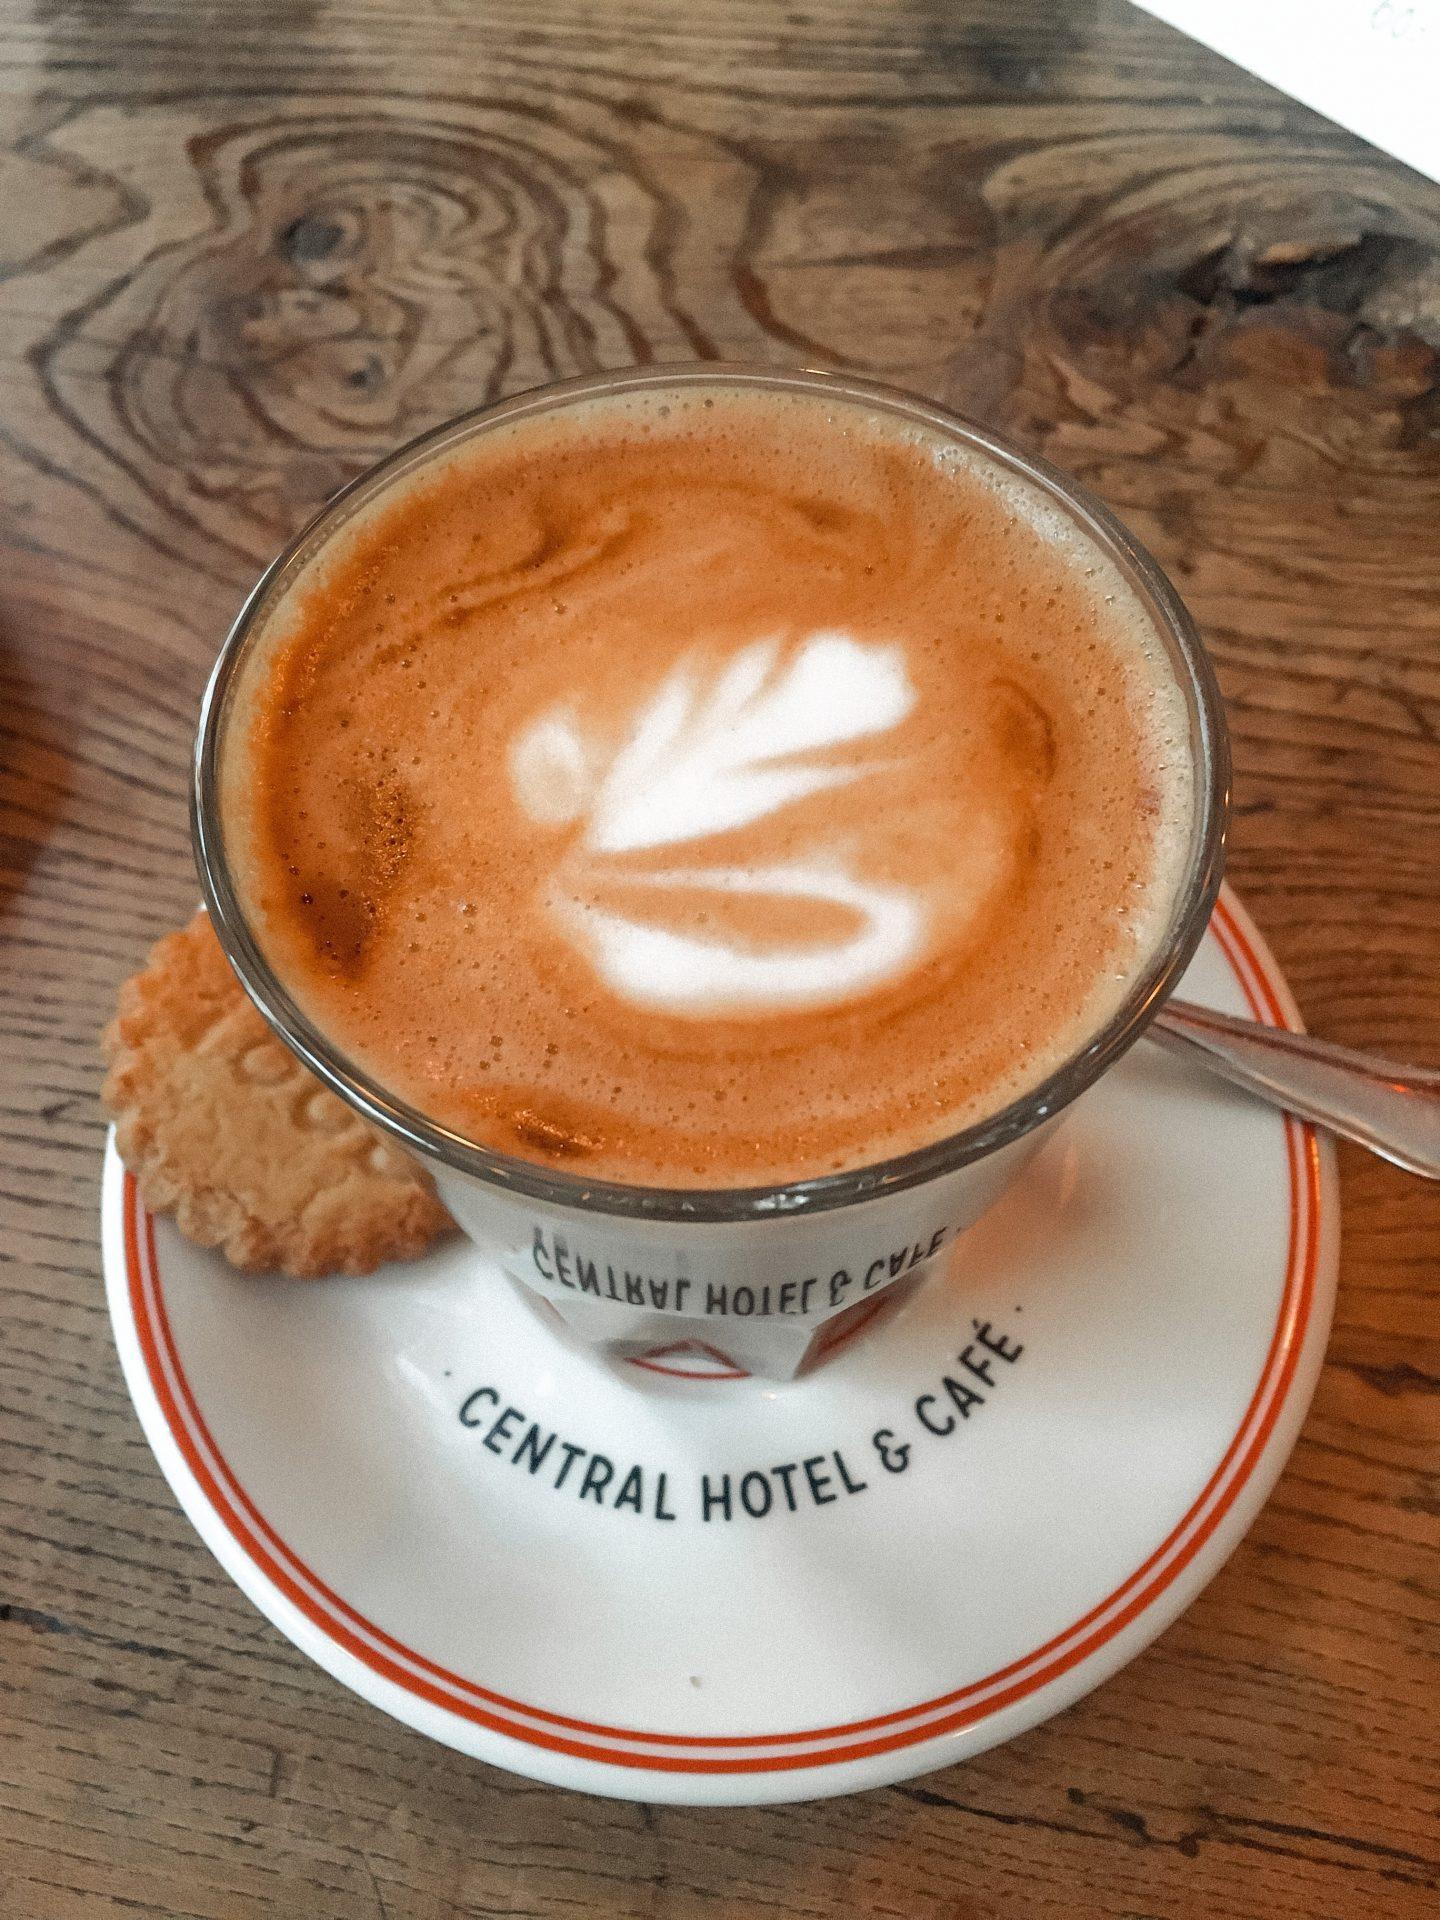 latte at Central Hotel & Café